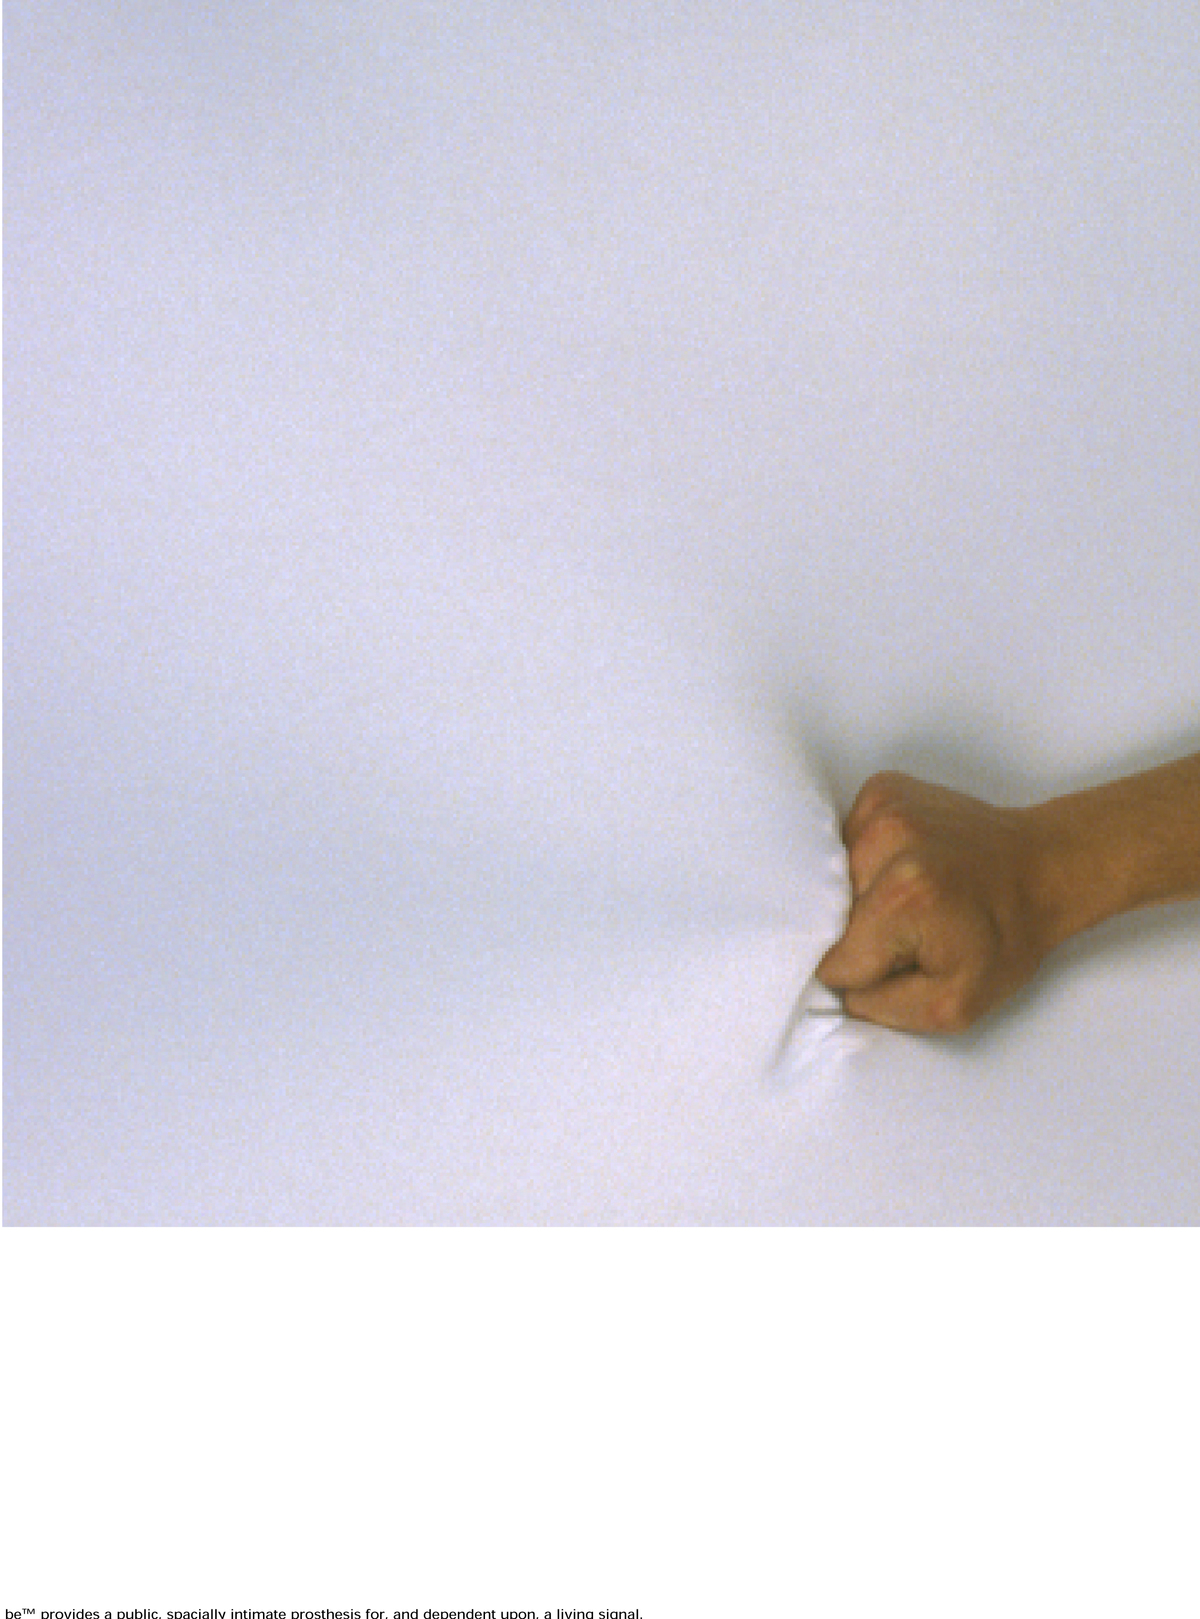 speranta-octavia maior david rhose haptic communication device ideas competition